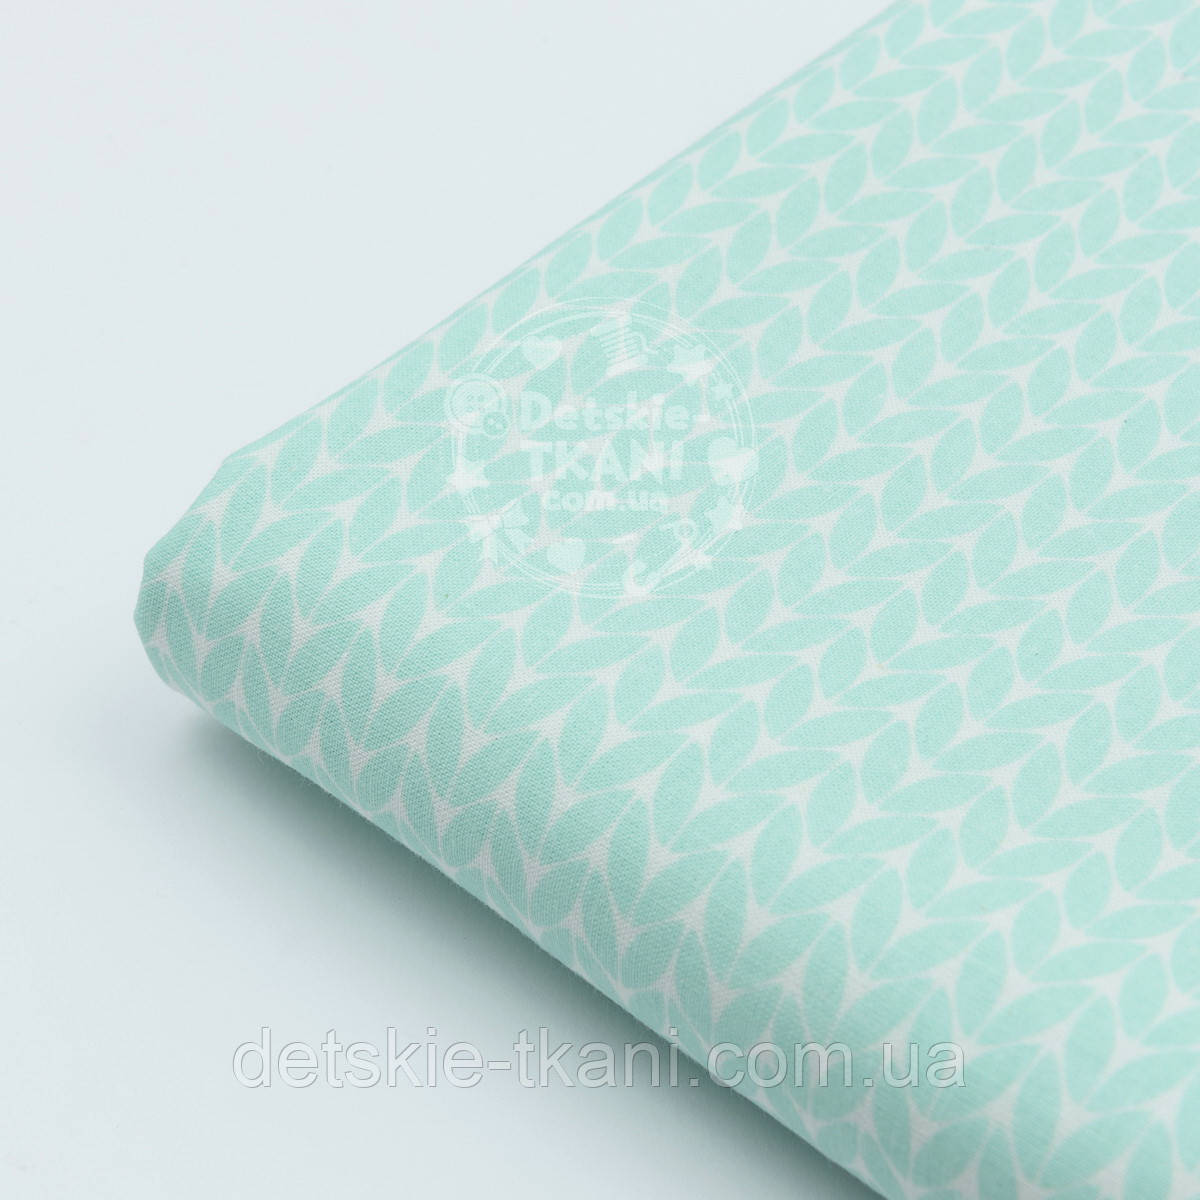 Лоскут ткани №346б размером 35*80 см